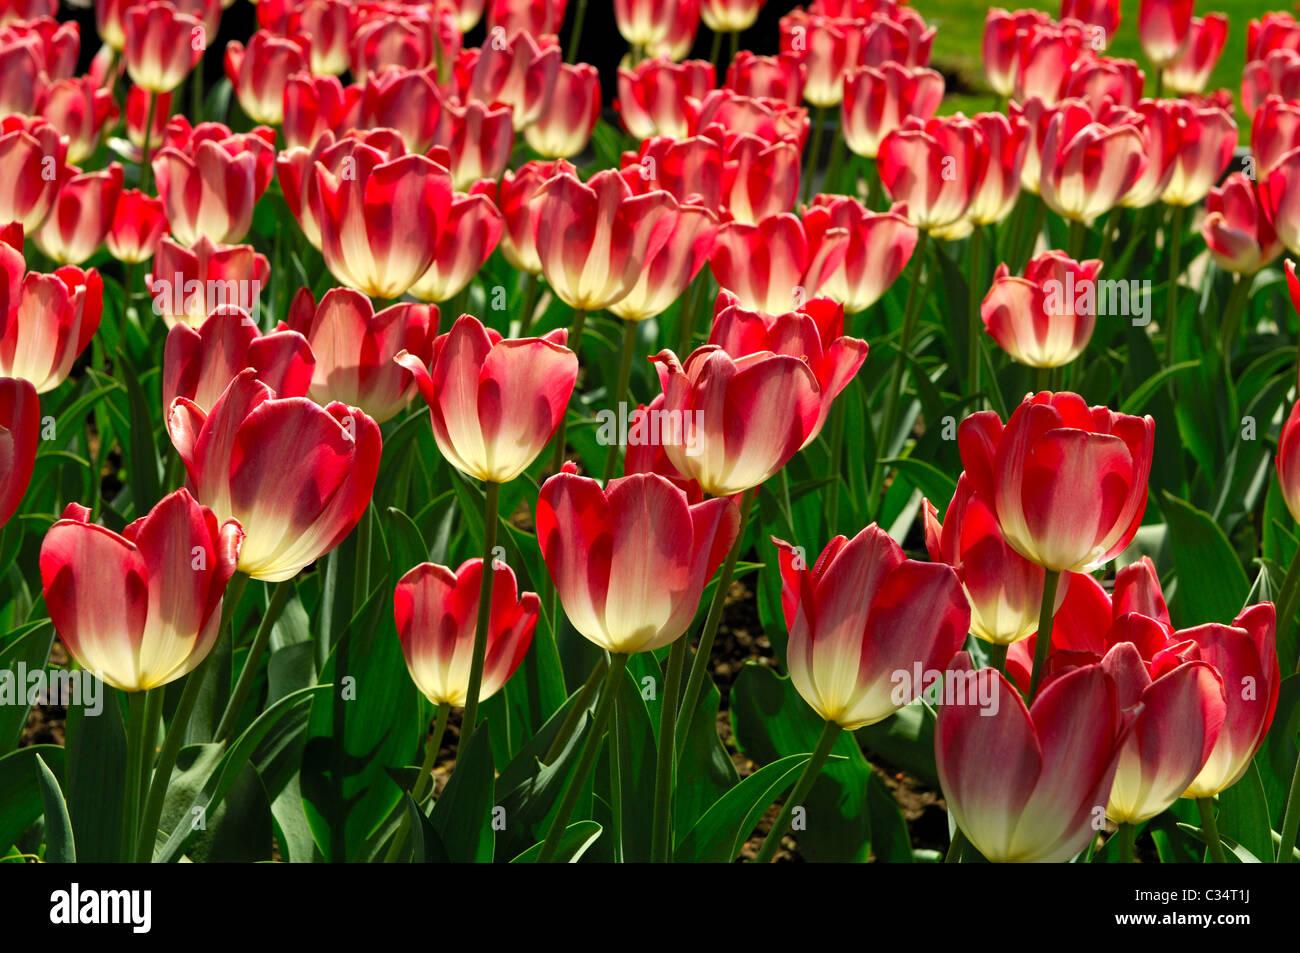 Big Chief tulip variety, Dutch Tulips - Stock Image